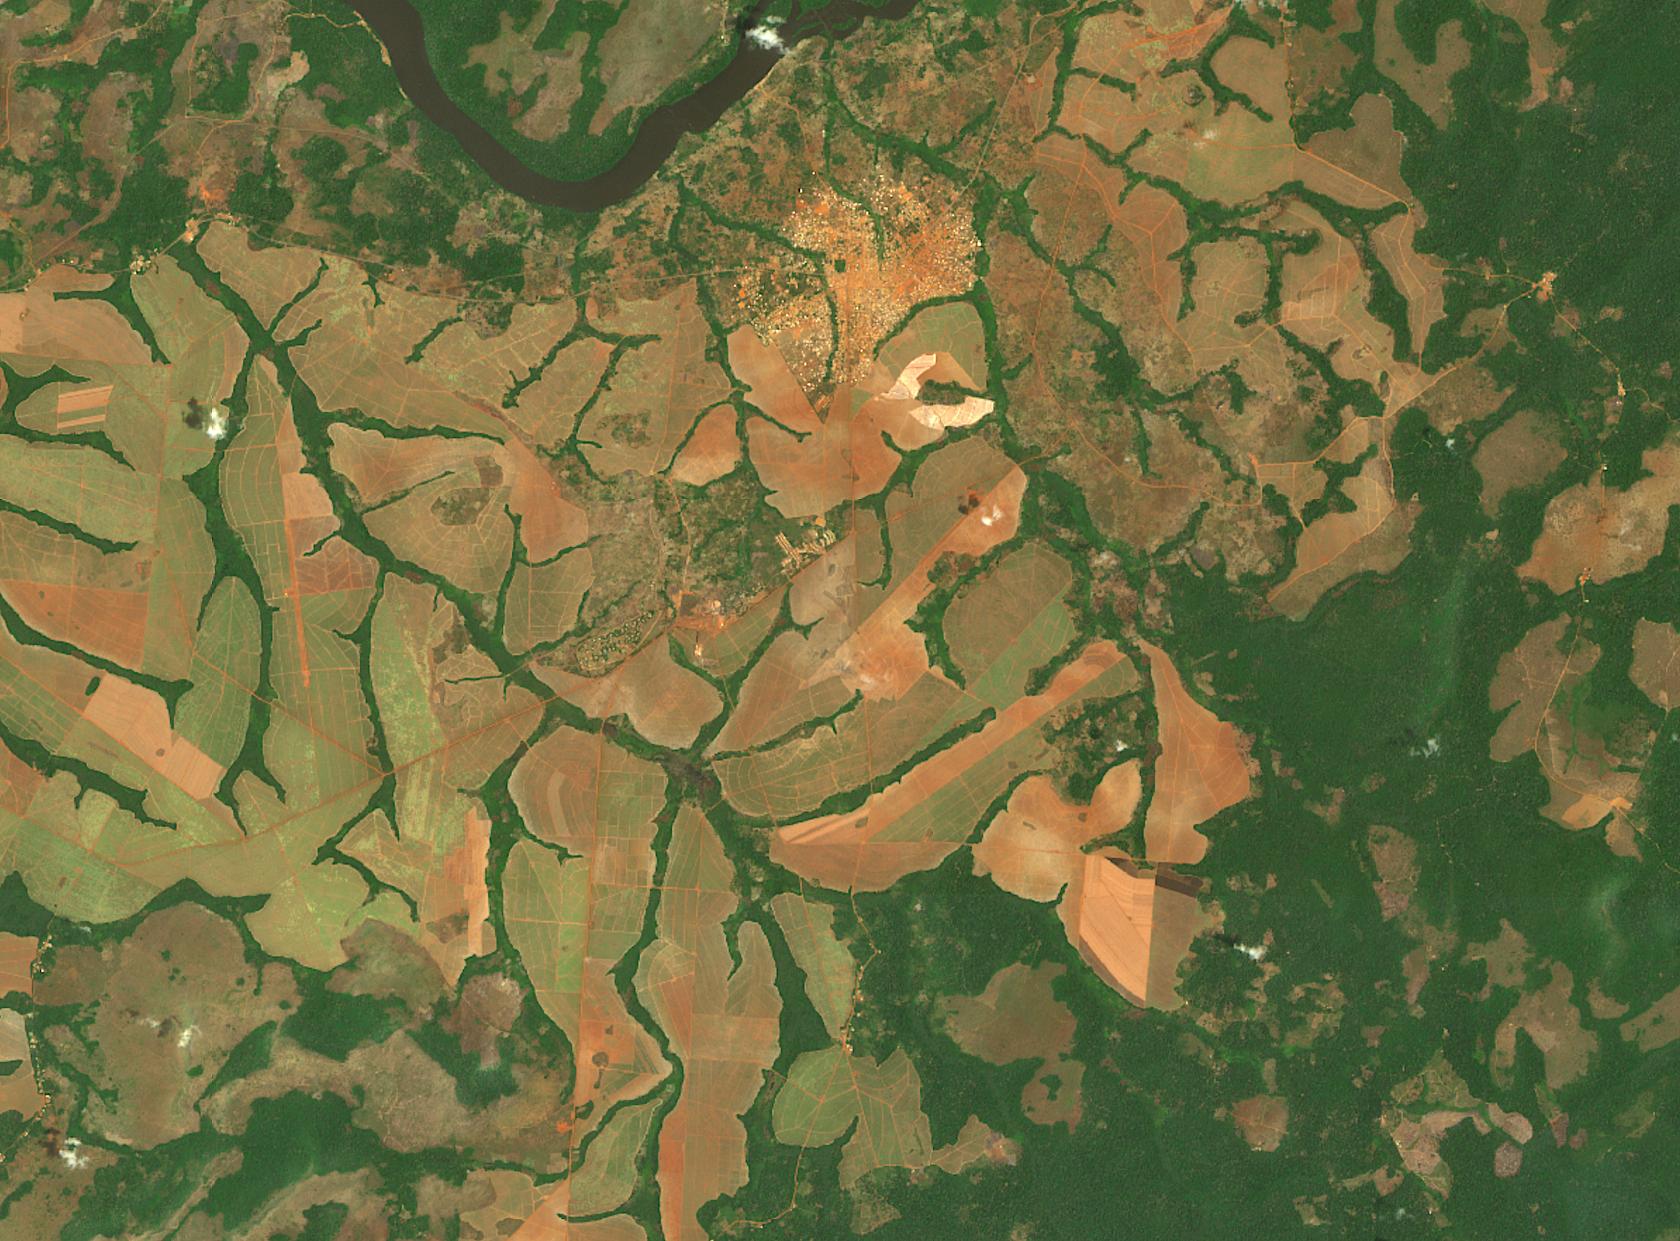 Acquiring Satellite Imagery for Predicting Deforestation